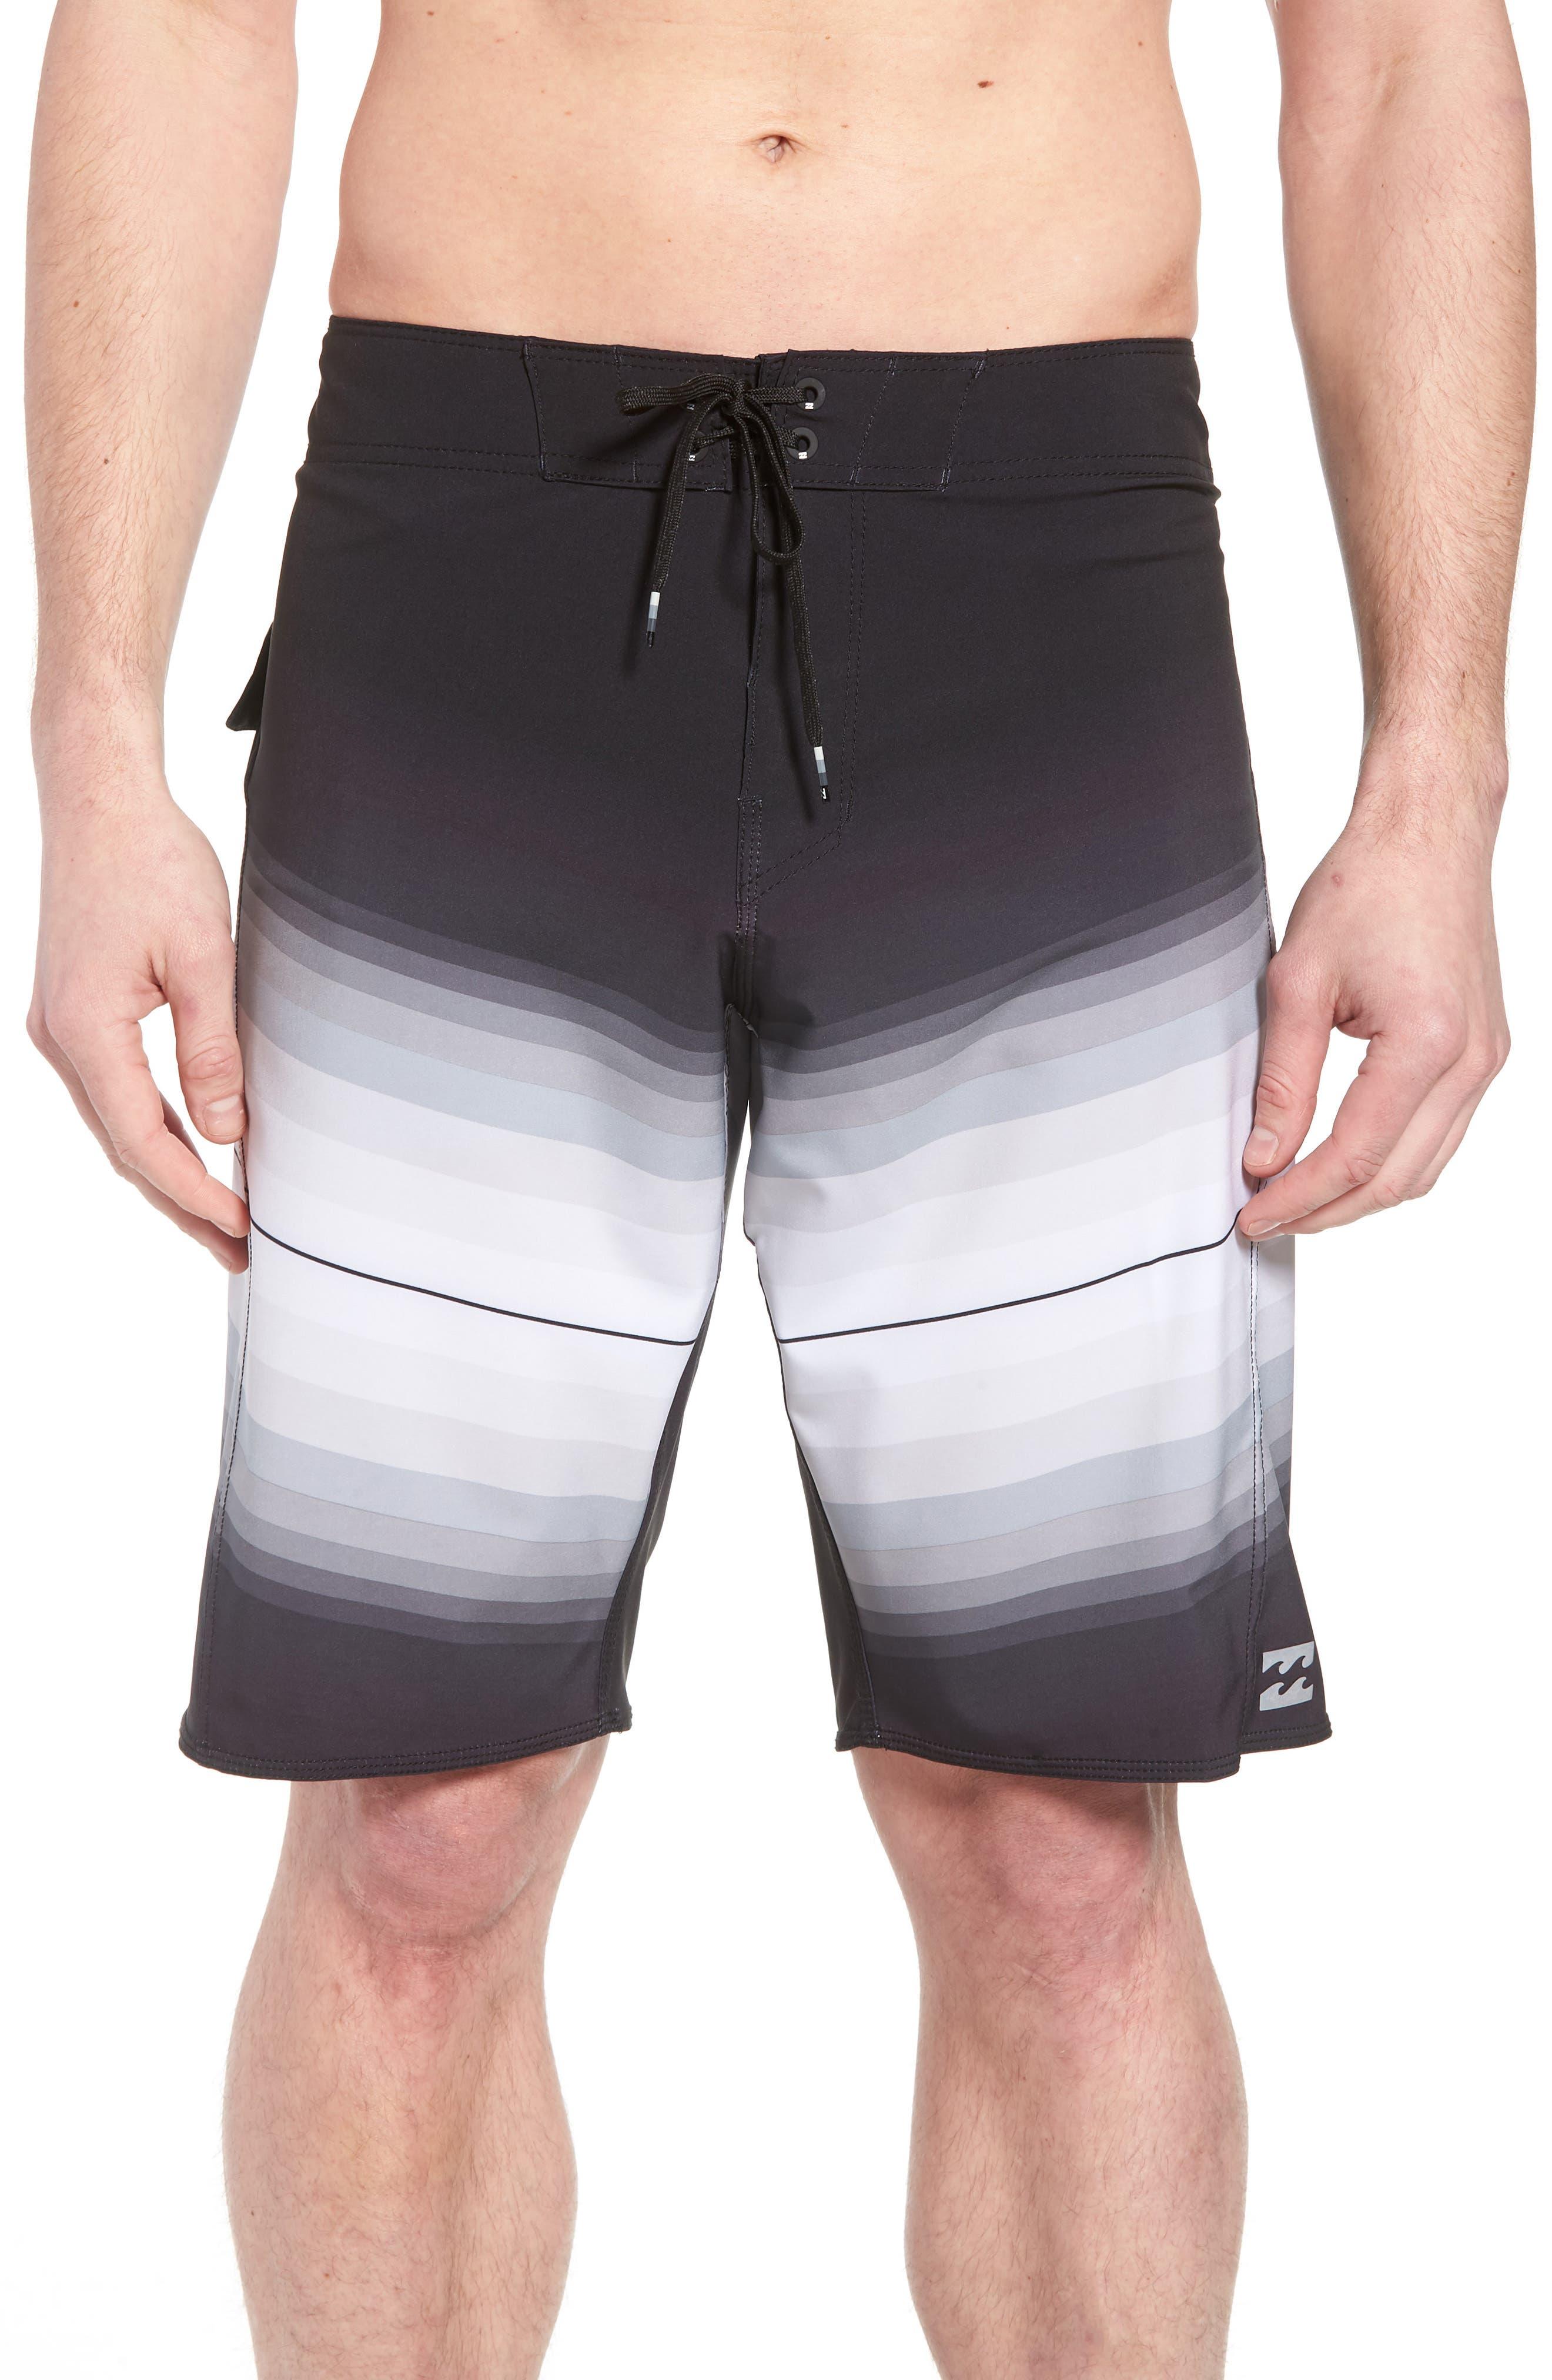 Fluid X Board Shorts,                             Main thumbnail 1, color,